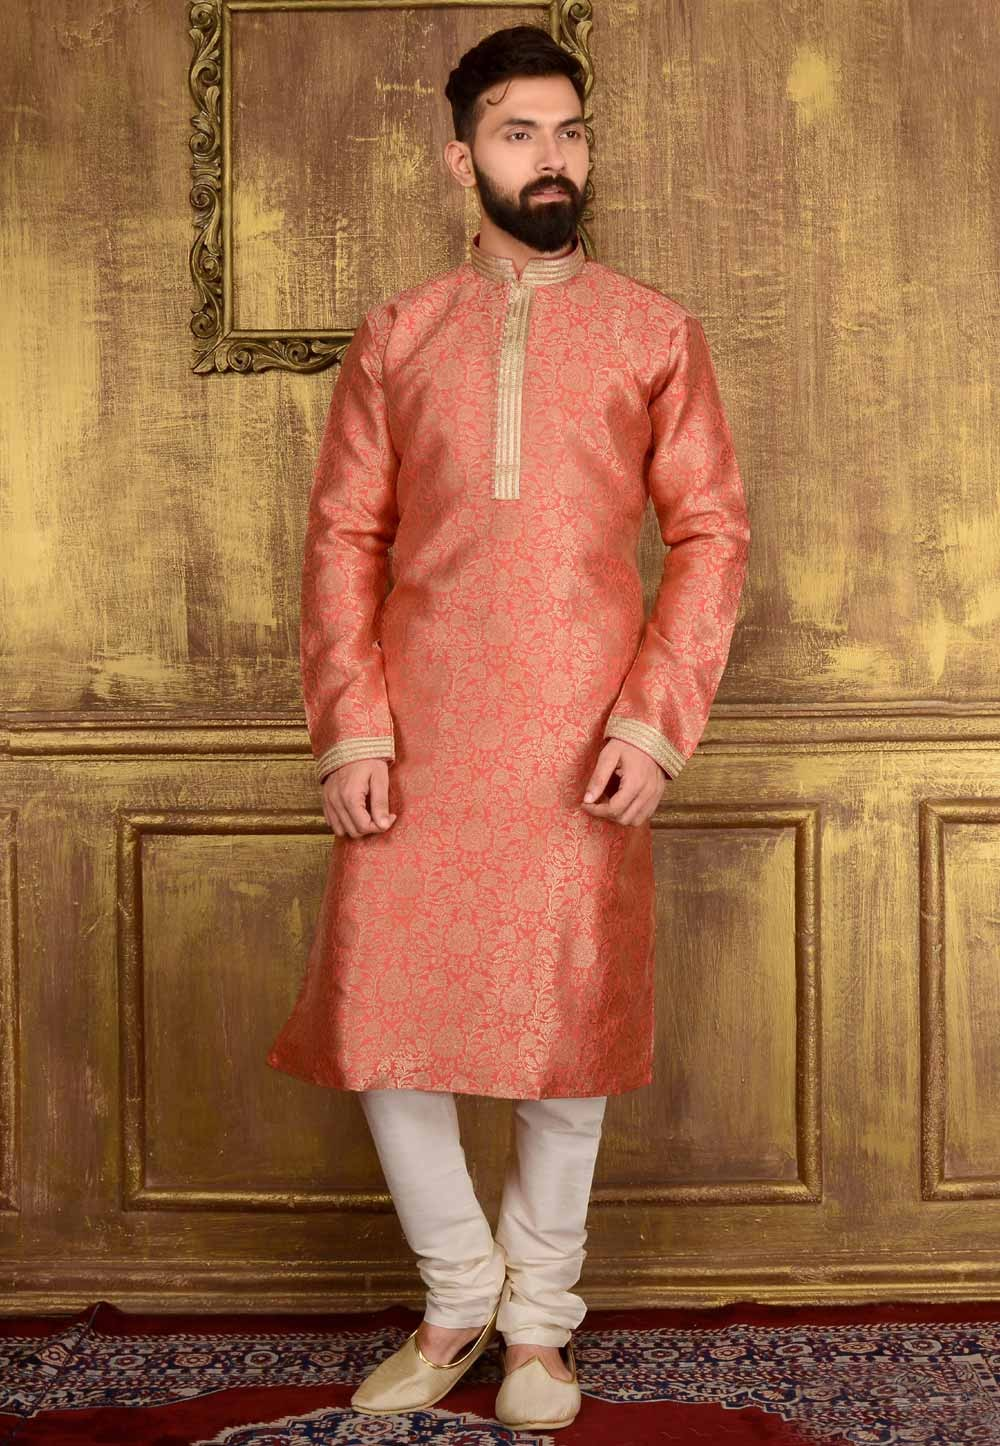 Red Color Jacquard,Banarasi Silk Men's Jacquard Readymade Kurta Pajama.